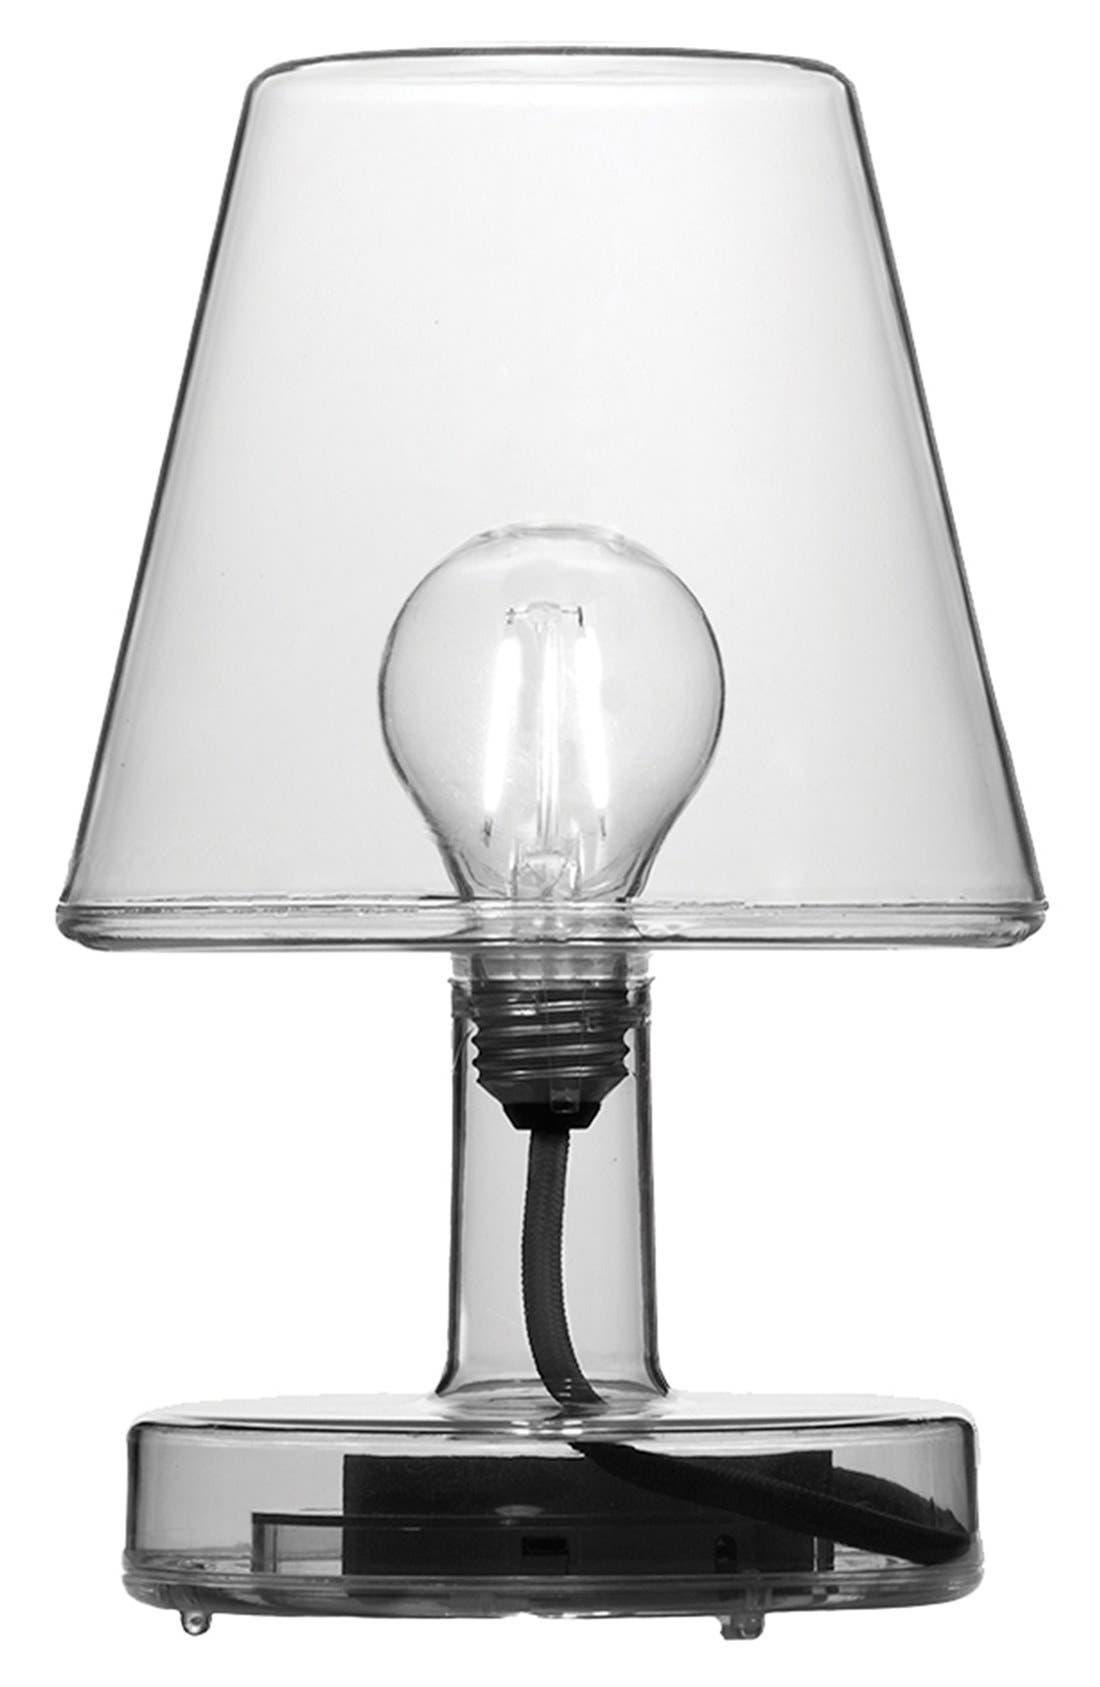 Alternate Image 1 Selected - Fatboy Transloetje Lamp